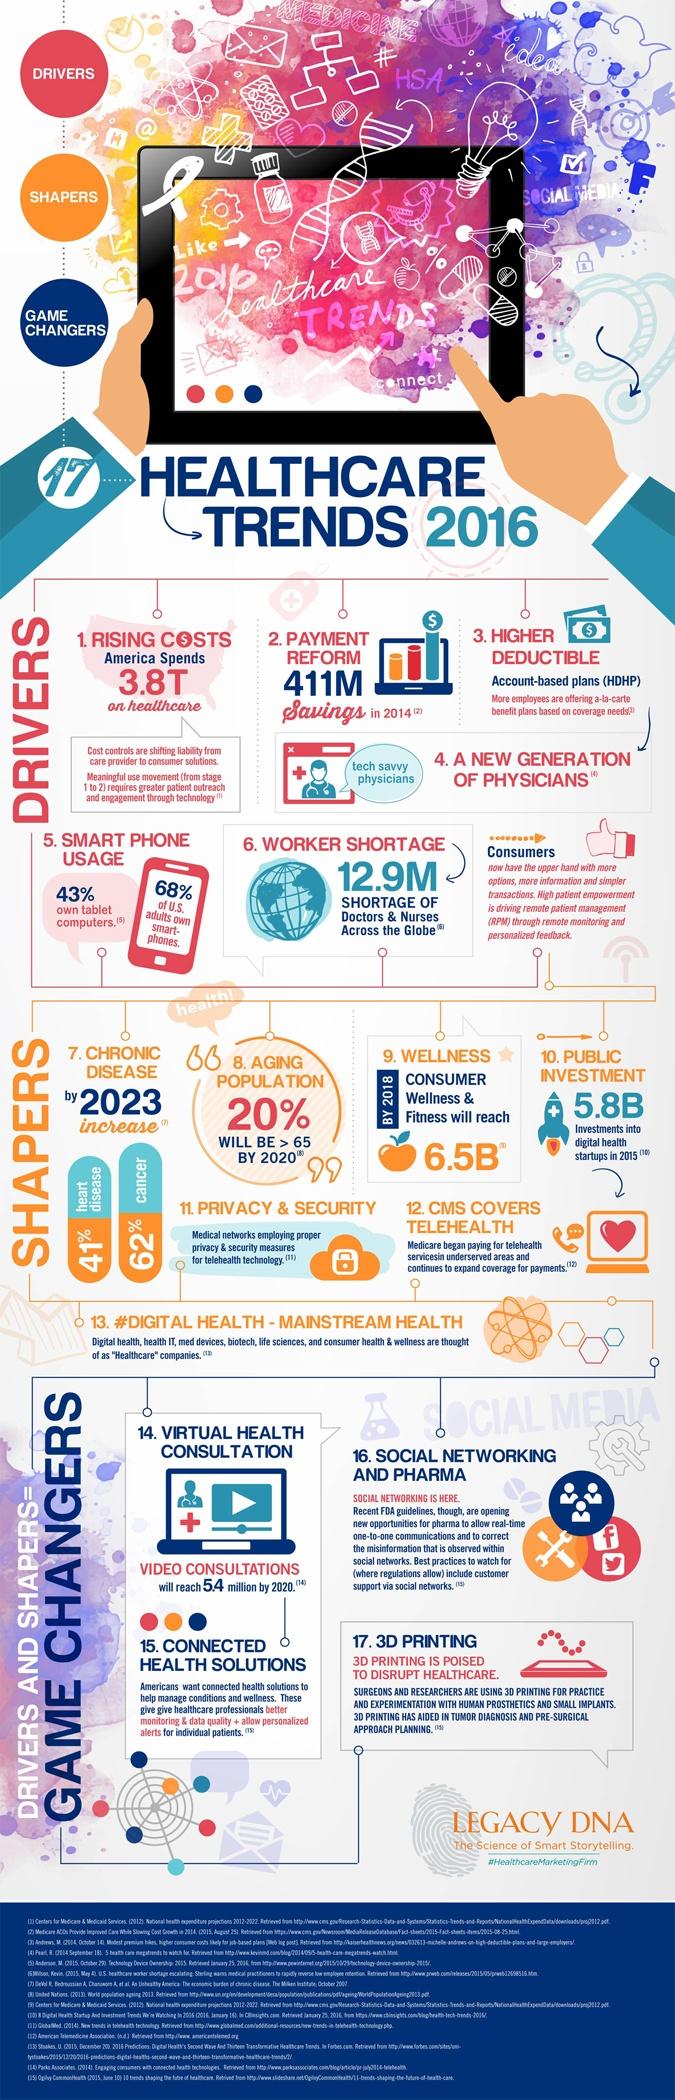 Healthcare Trends 2016